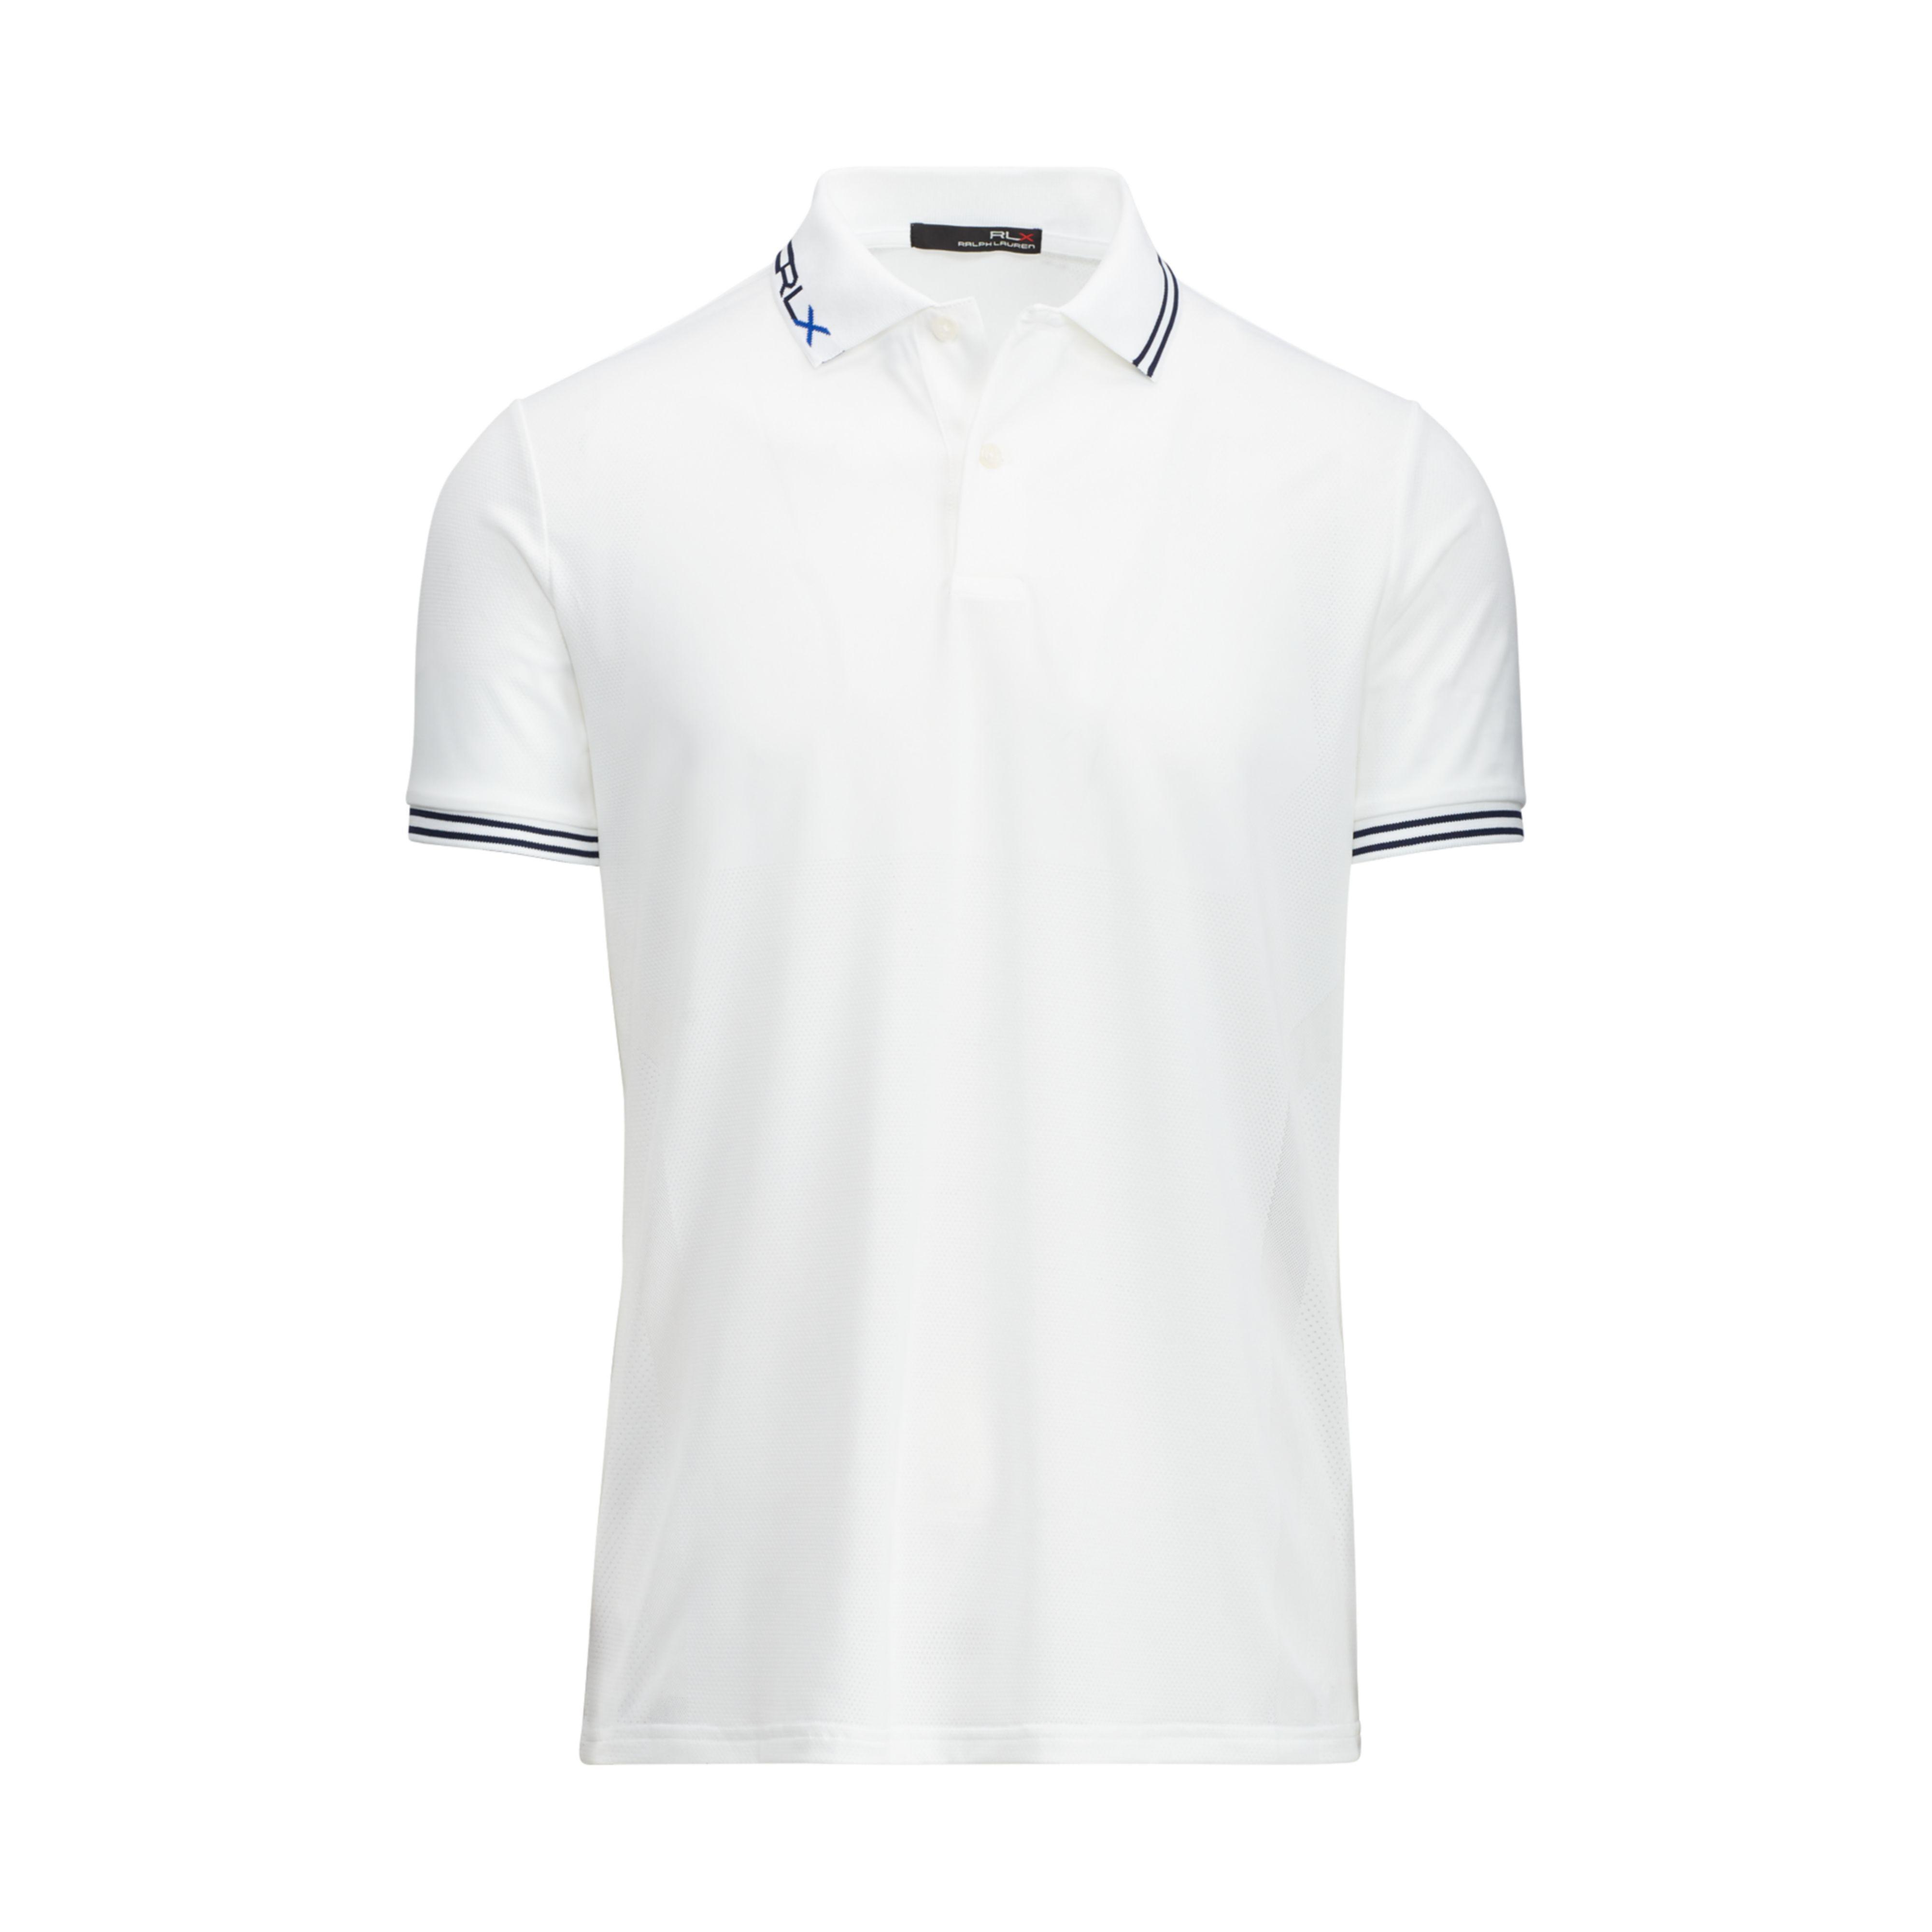 c7286ccf2c3ed Custom White Polo Shirts